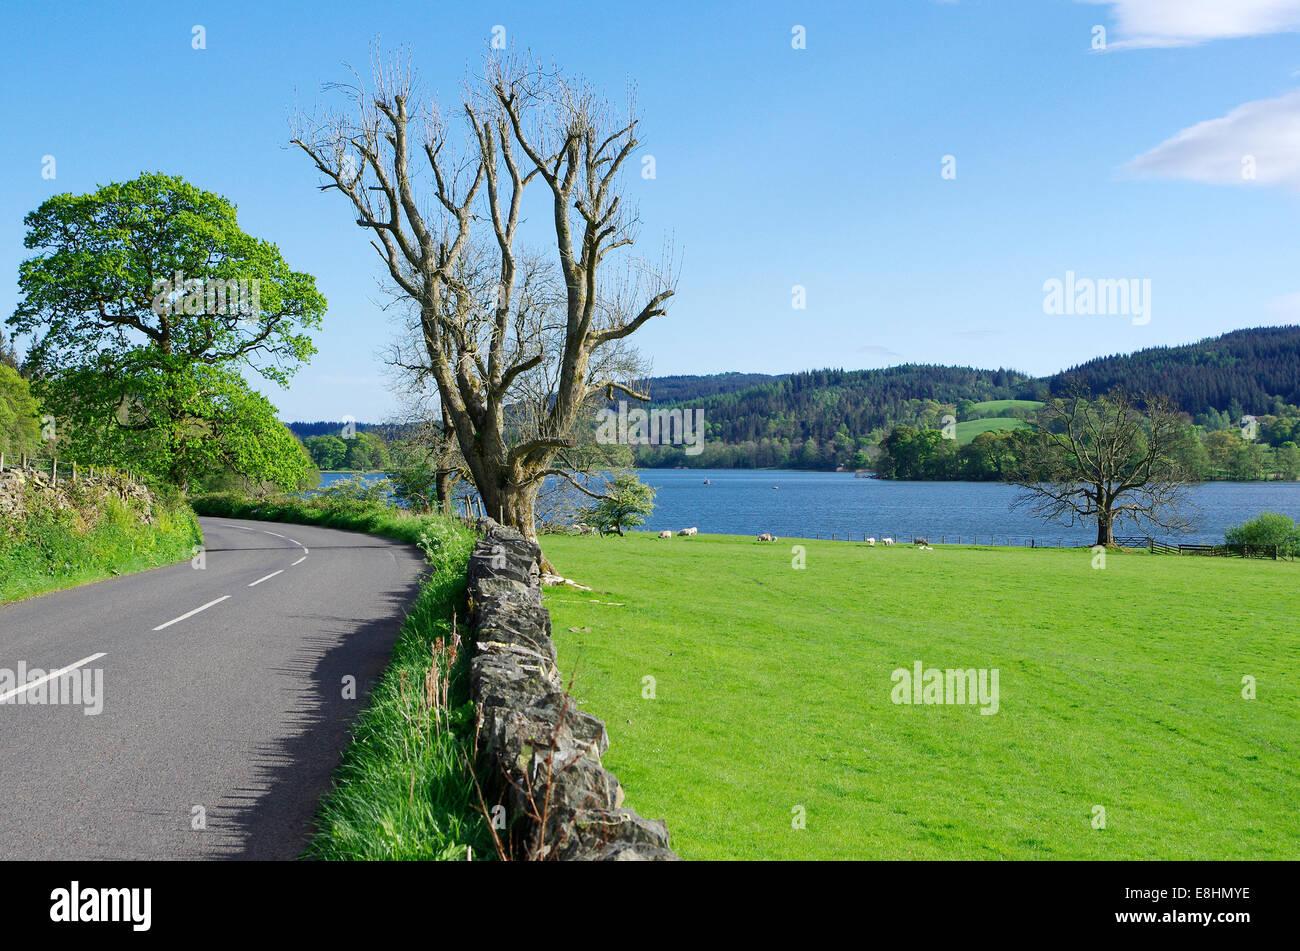 Esthwaite Water, Lake District National Park, Cumbria, England, UK - Stock Image